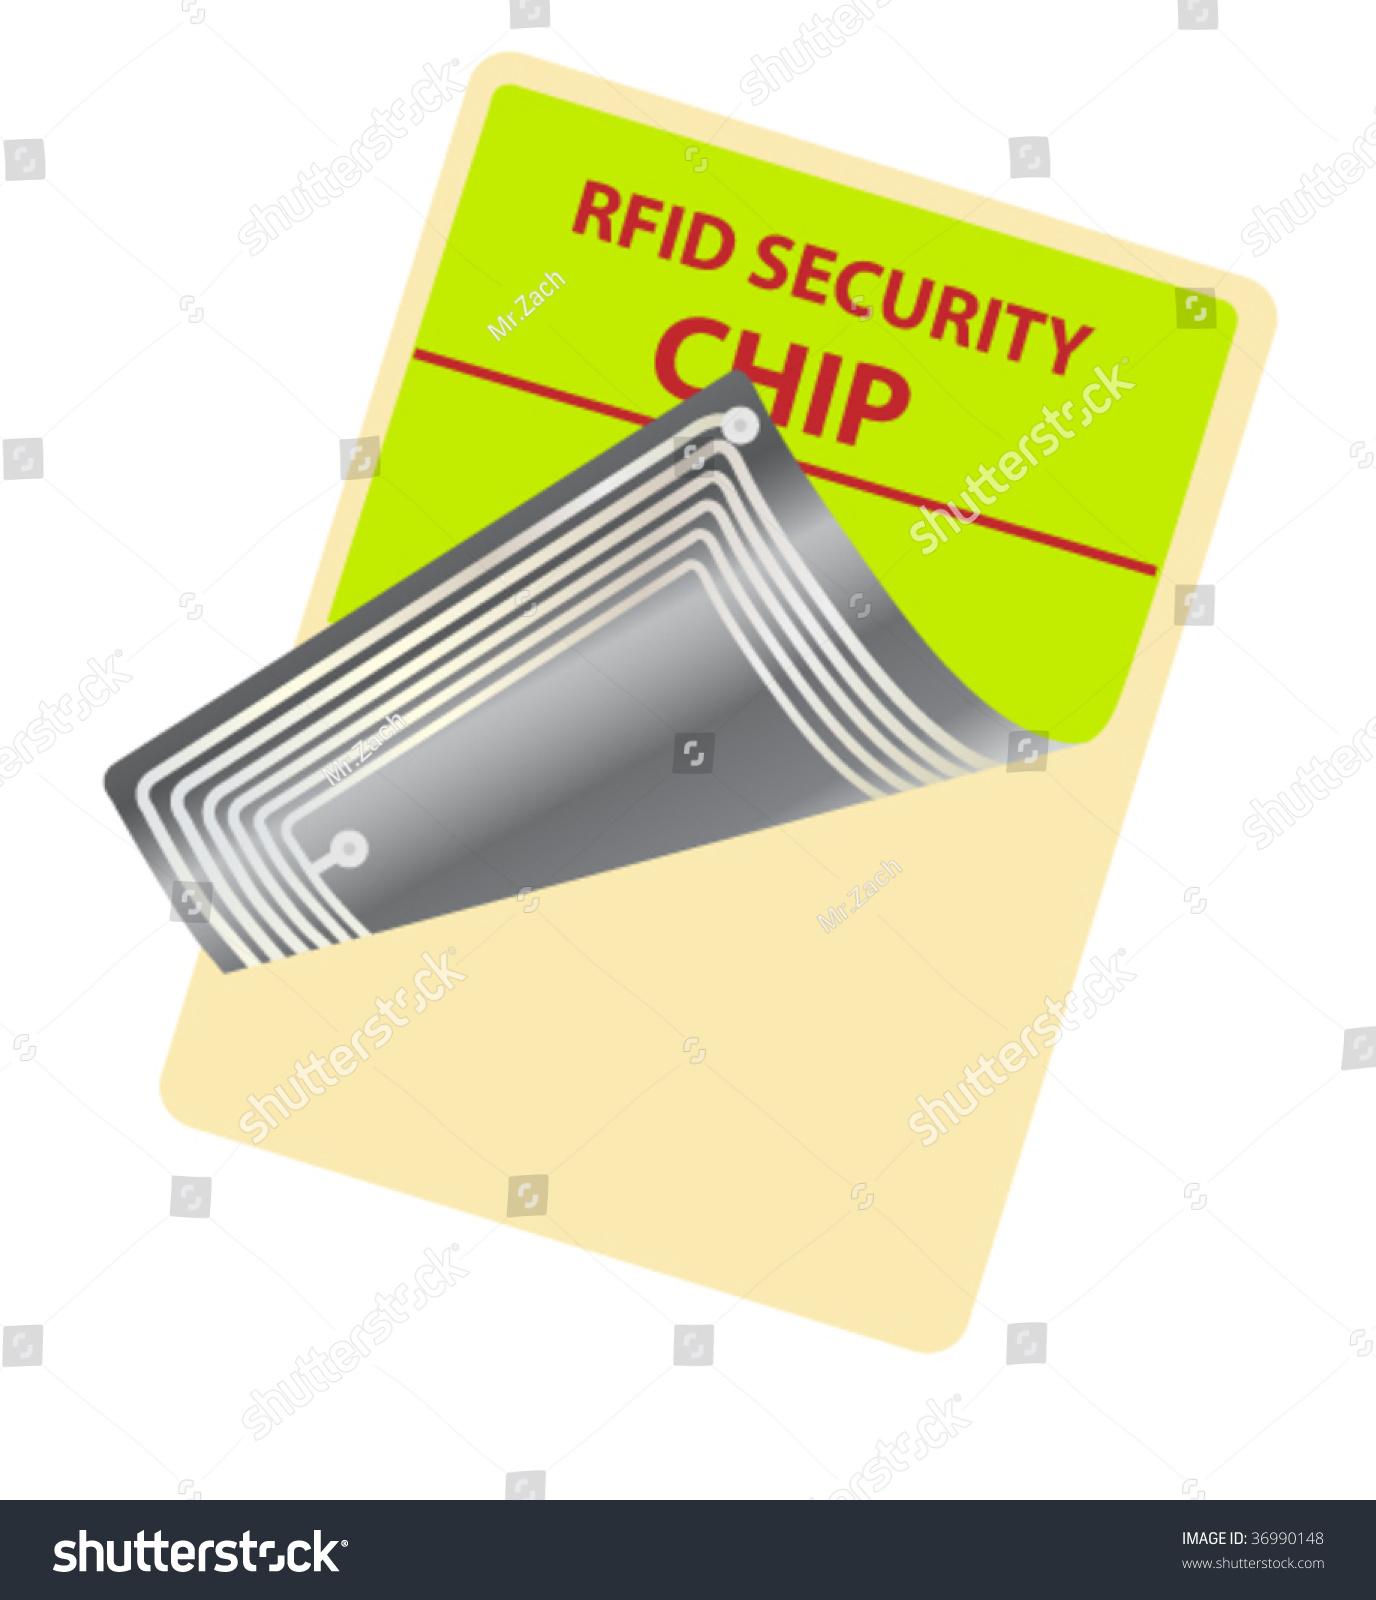 tag with rfid chip stock vector illustration 36990148 shutterstock. Black Bedroom Furniture Sets. Home Design Ideas